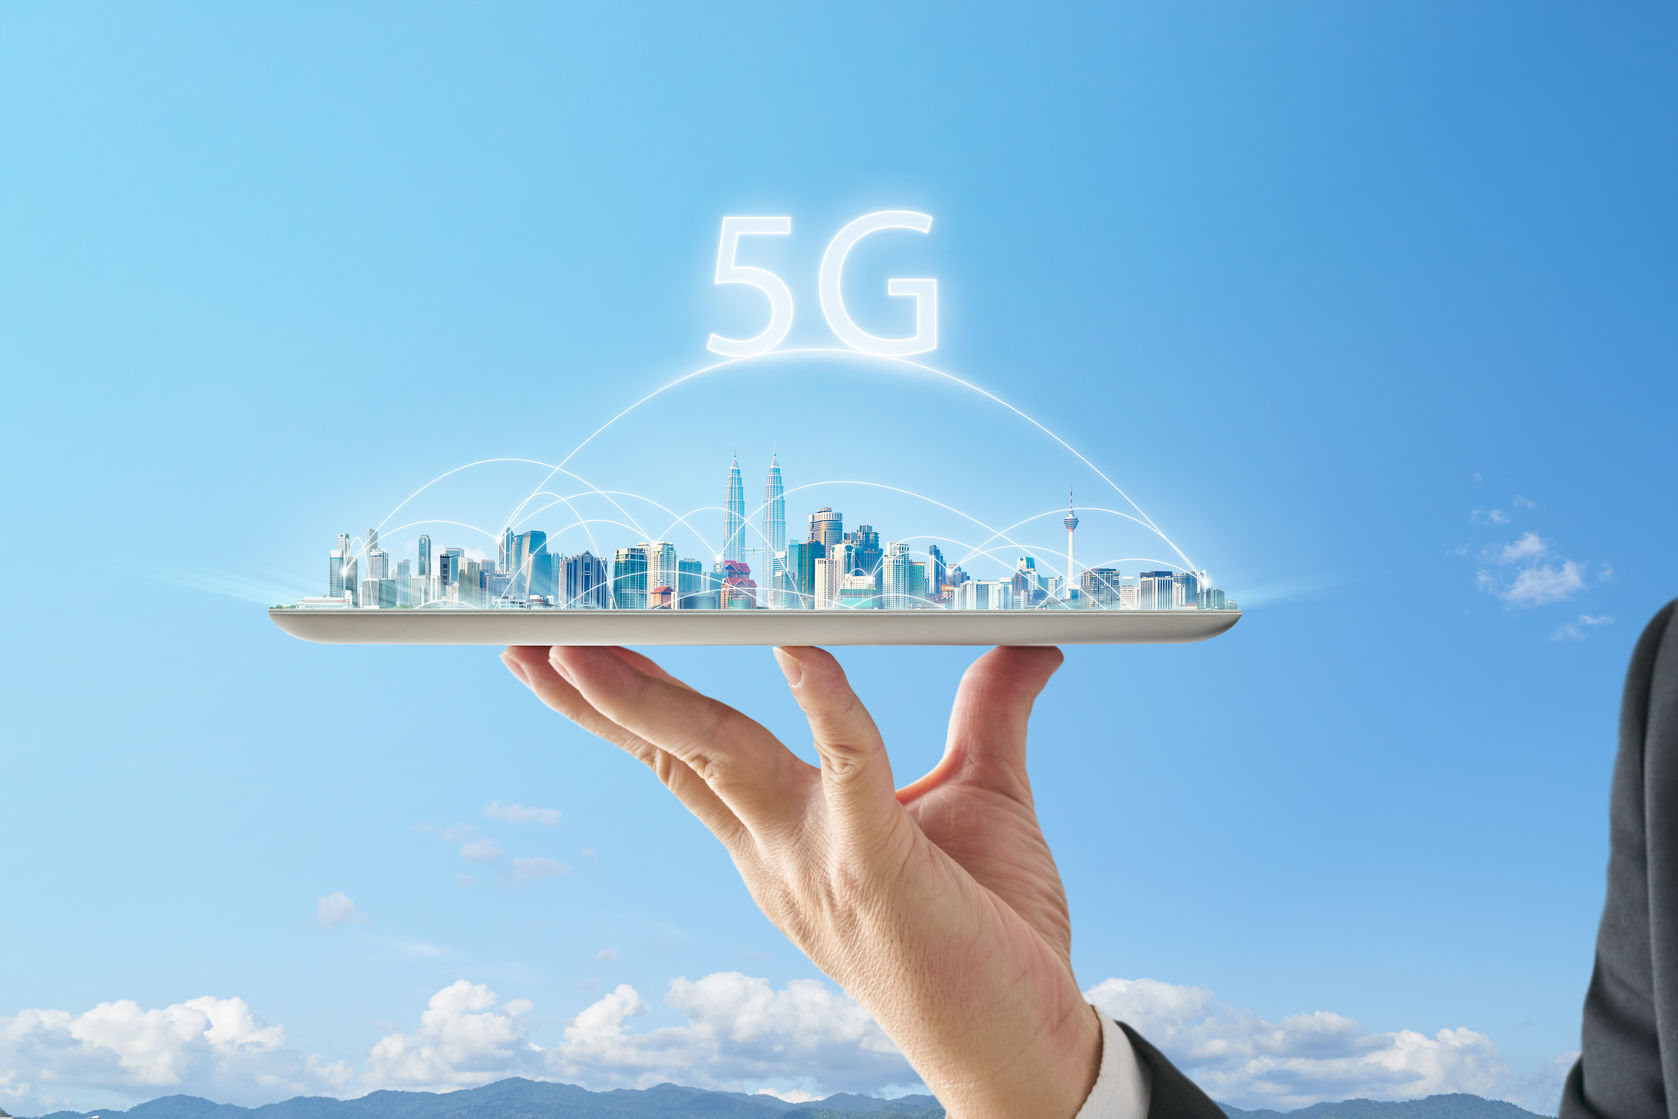 5G/4G概念齐发力 通信板块再获上涨动能